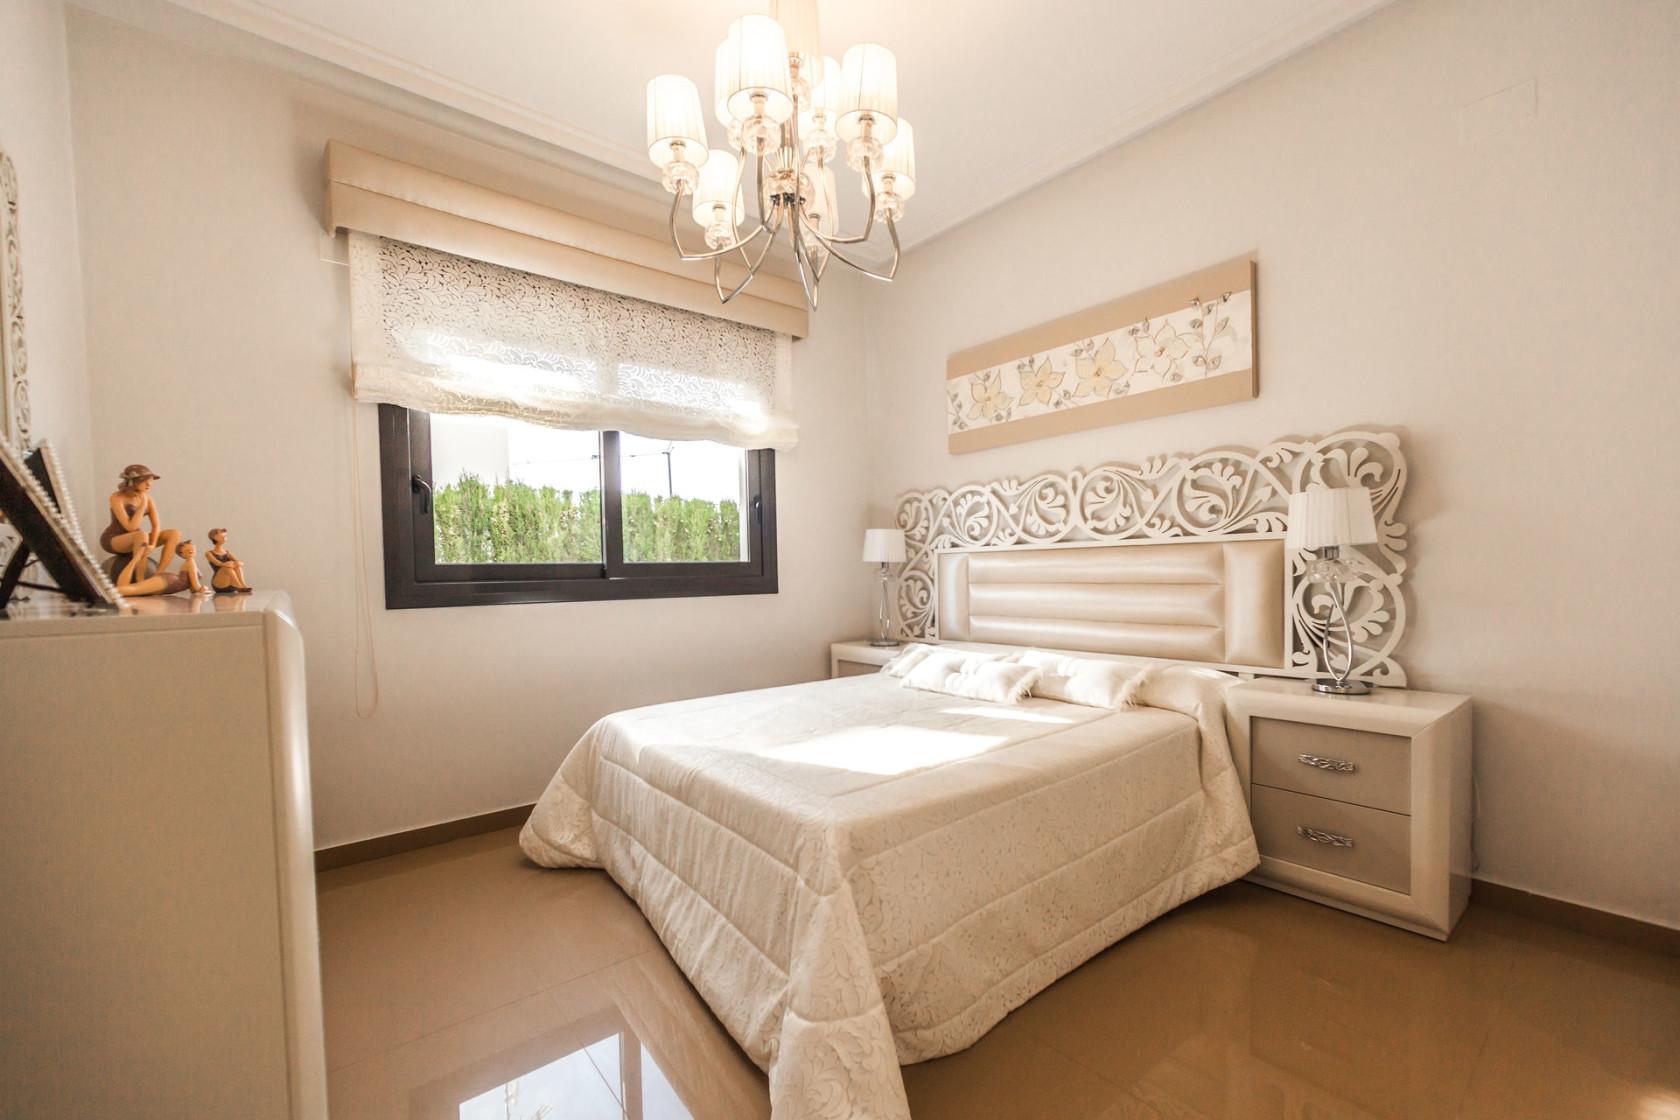 ialicante-mediterranean-homes-475799-unsplash.jpg